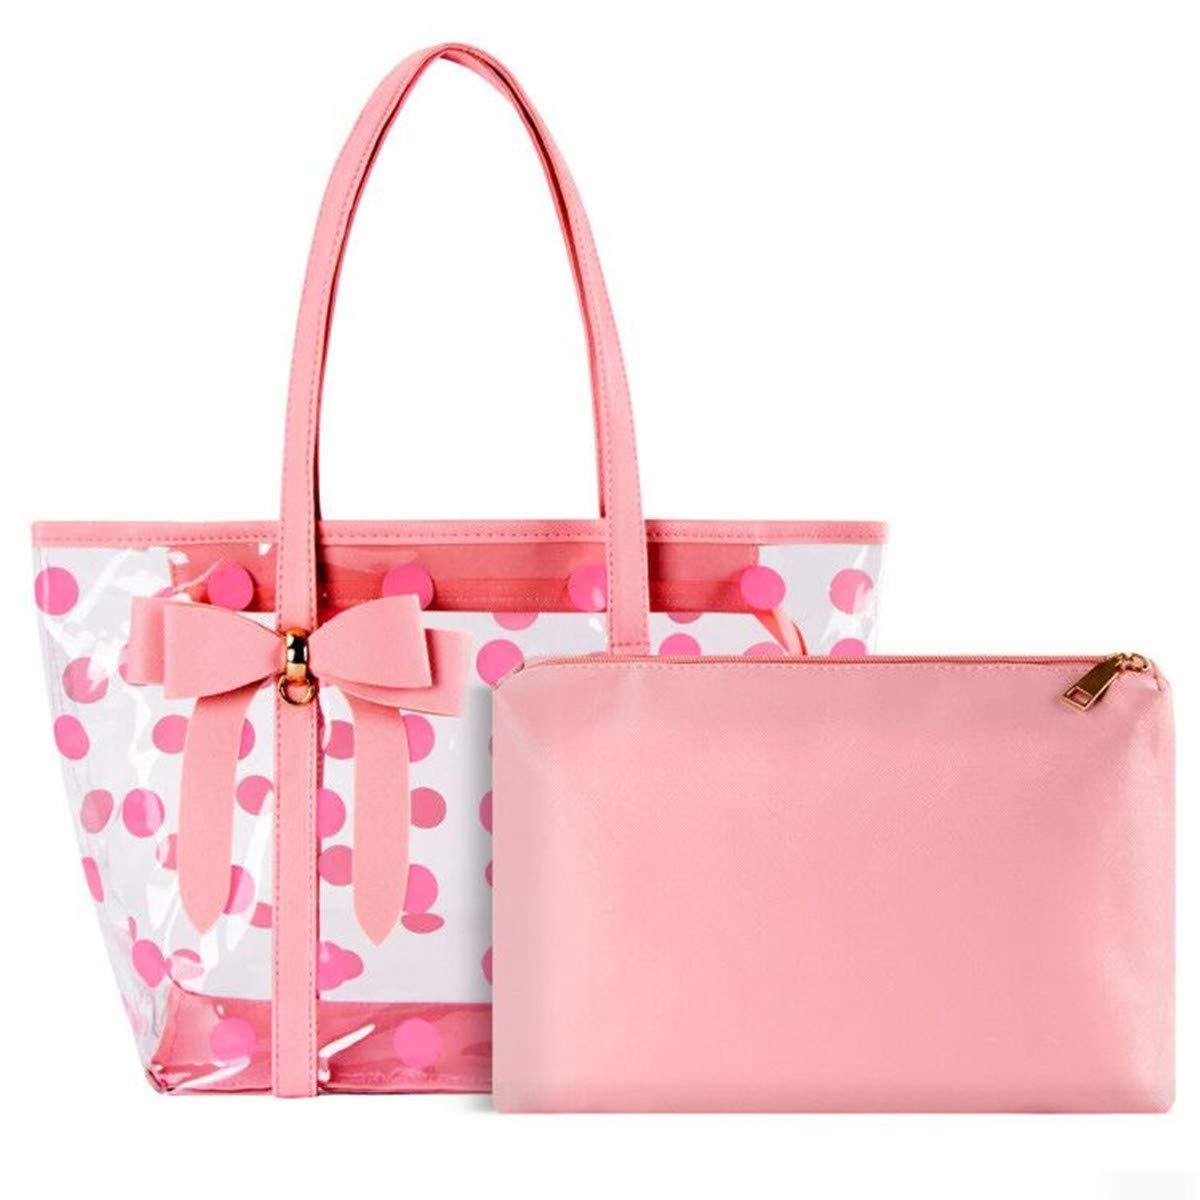 xhorizon FL1 Waterproof Clear Tote Purse Bag Travel Beach Handbag Gym Sports Bag